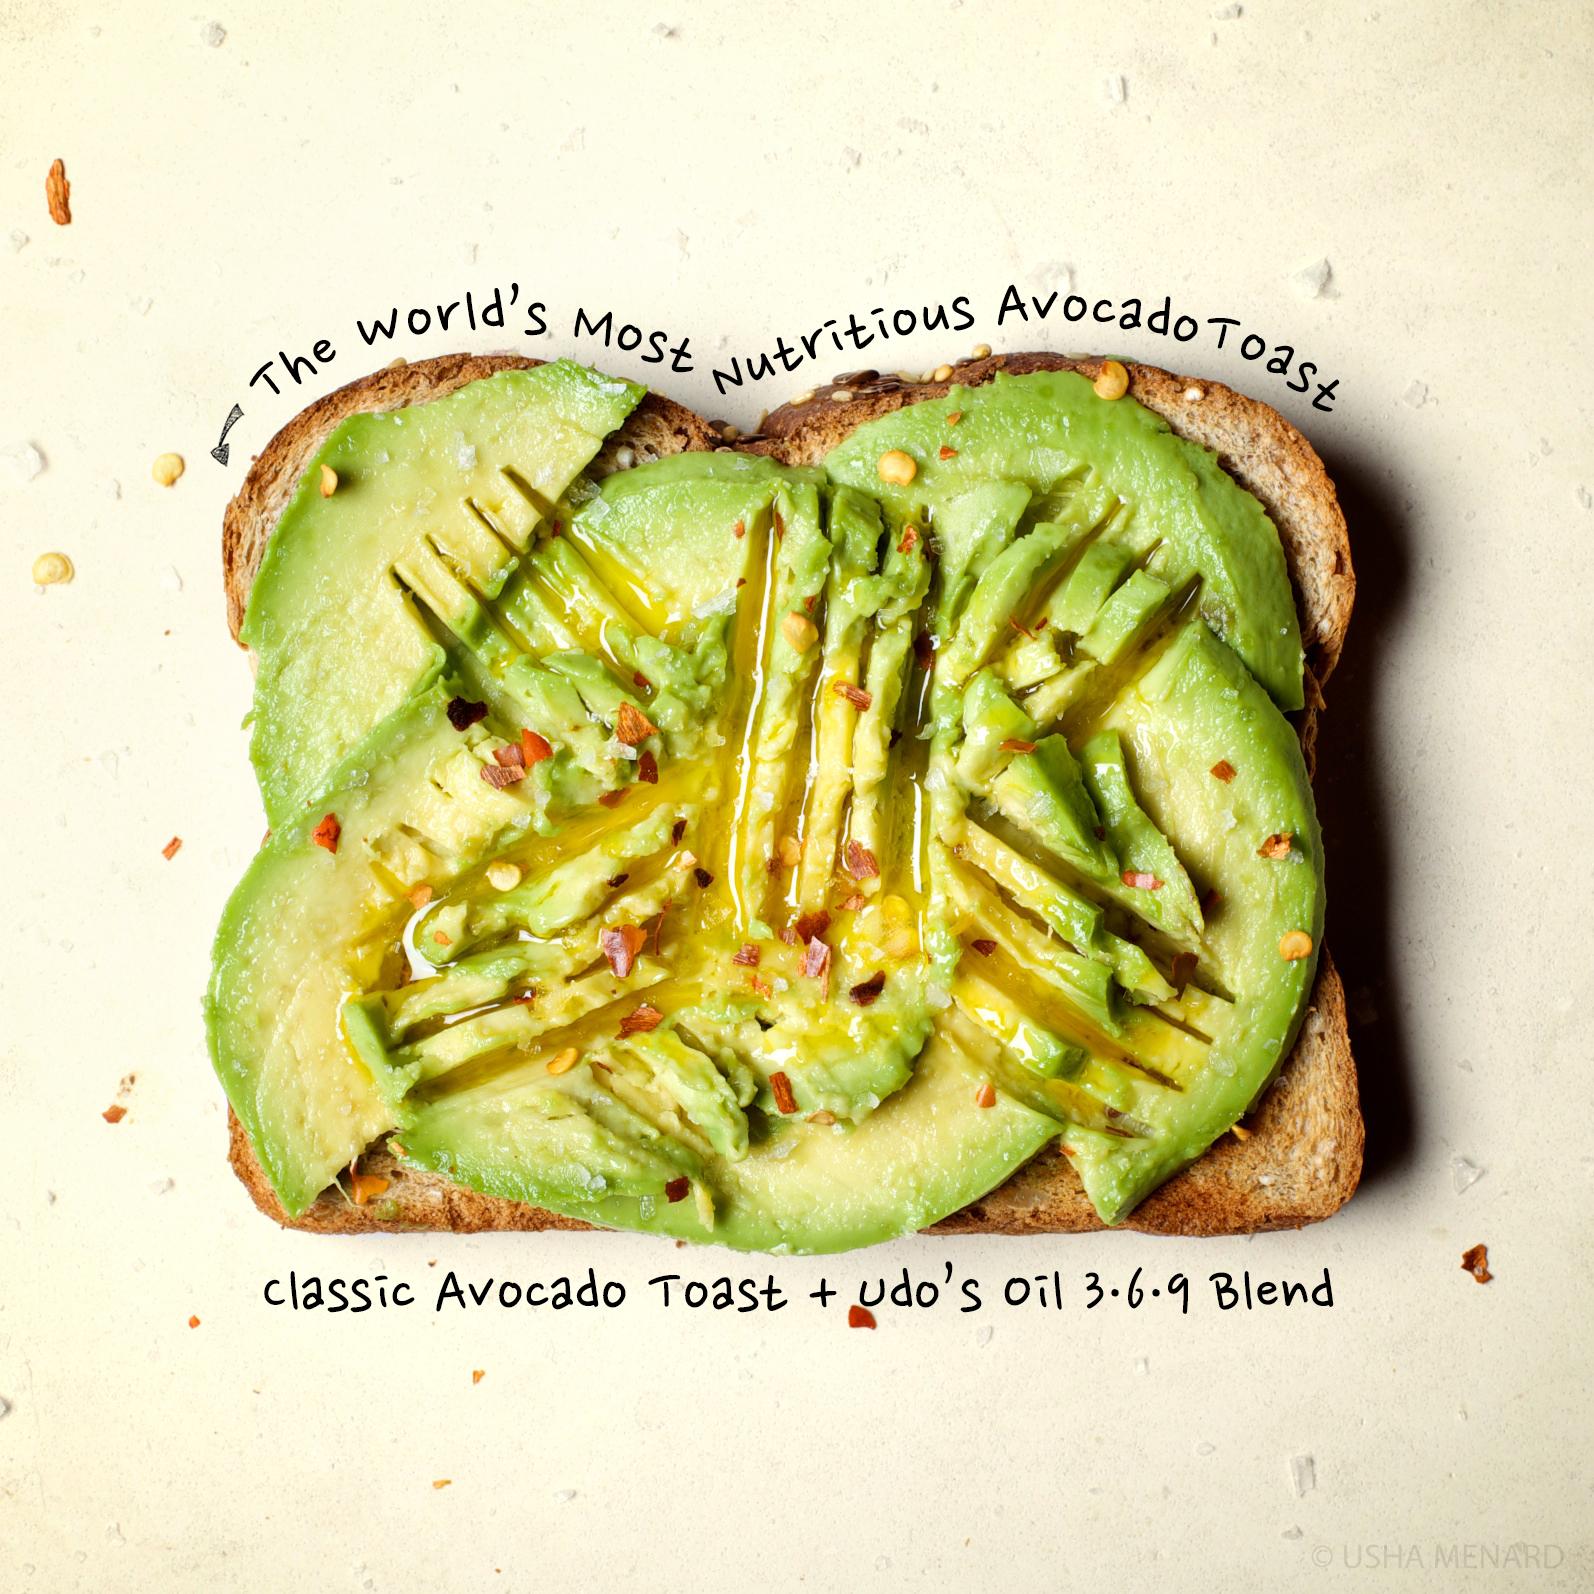 Udos_Oil_Avocado_Toast_4